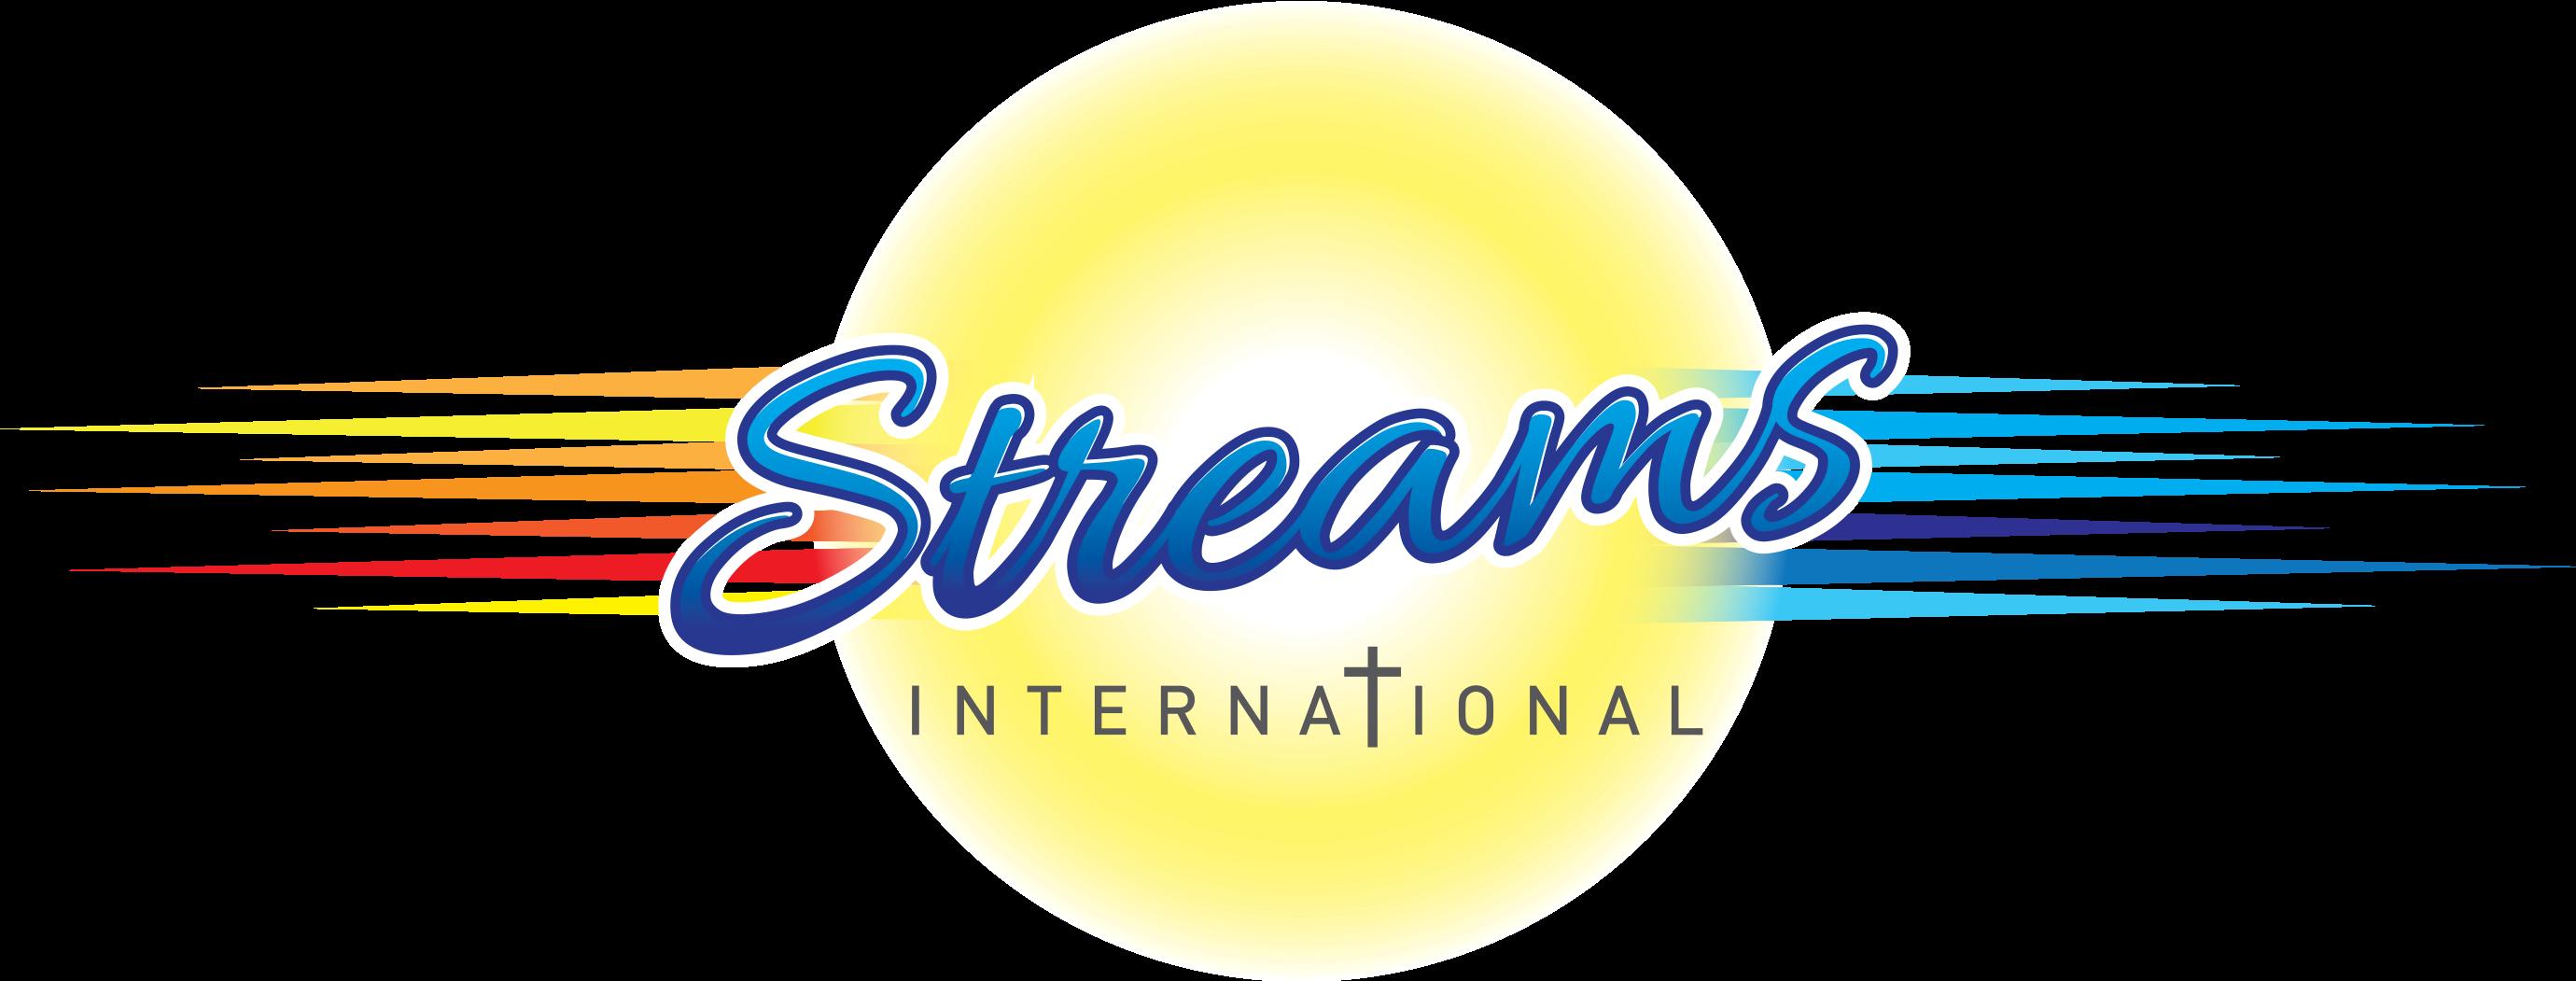 Streams International Podcasts